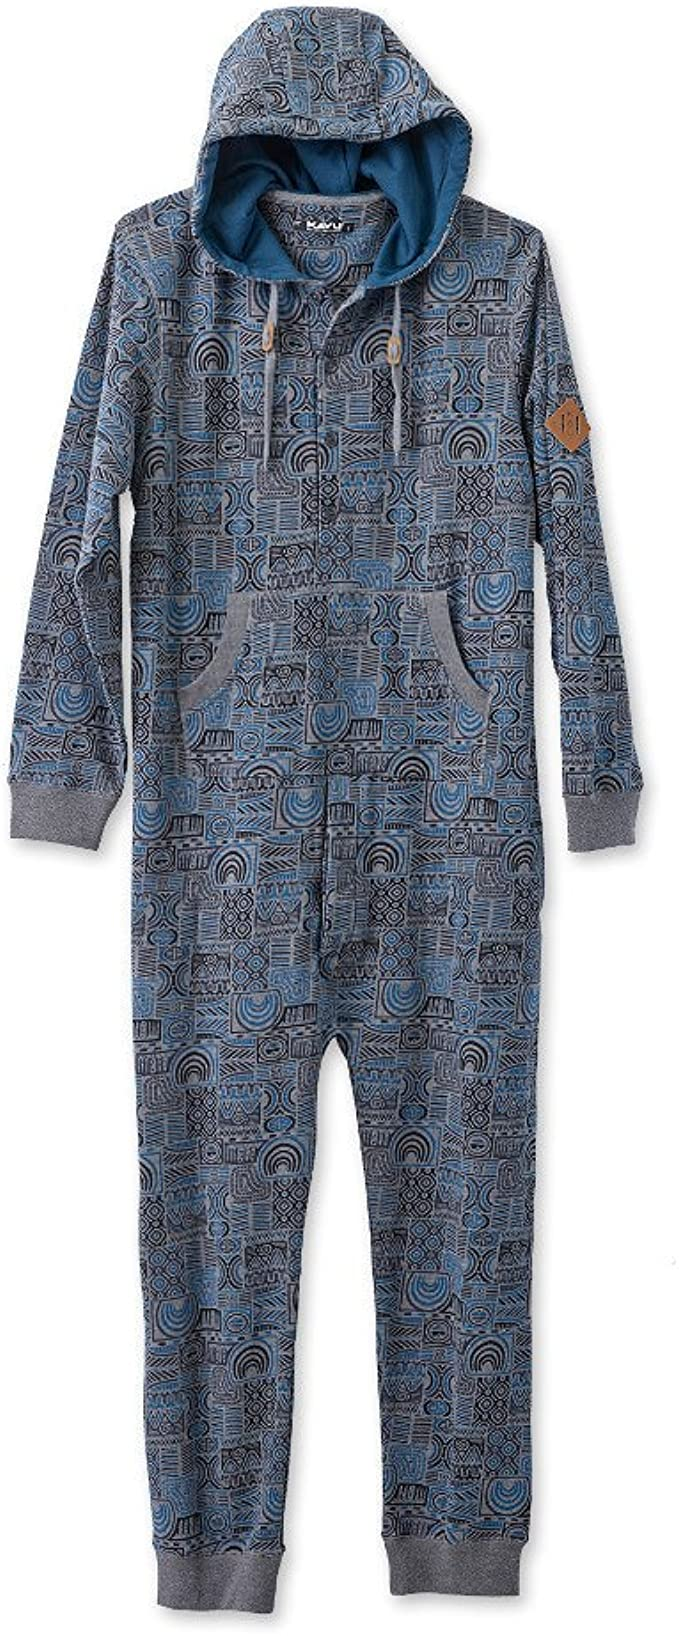 KAVU One Der Suit